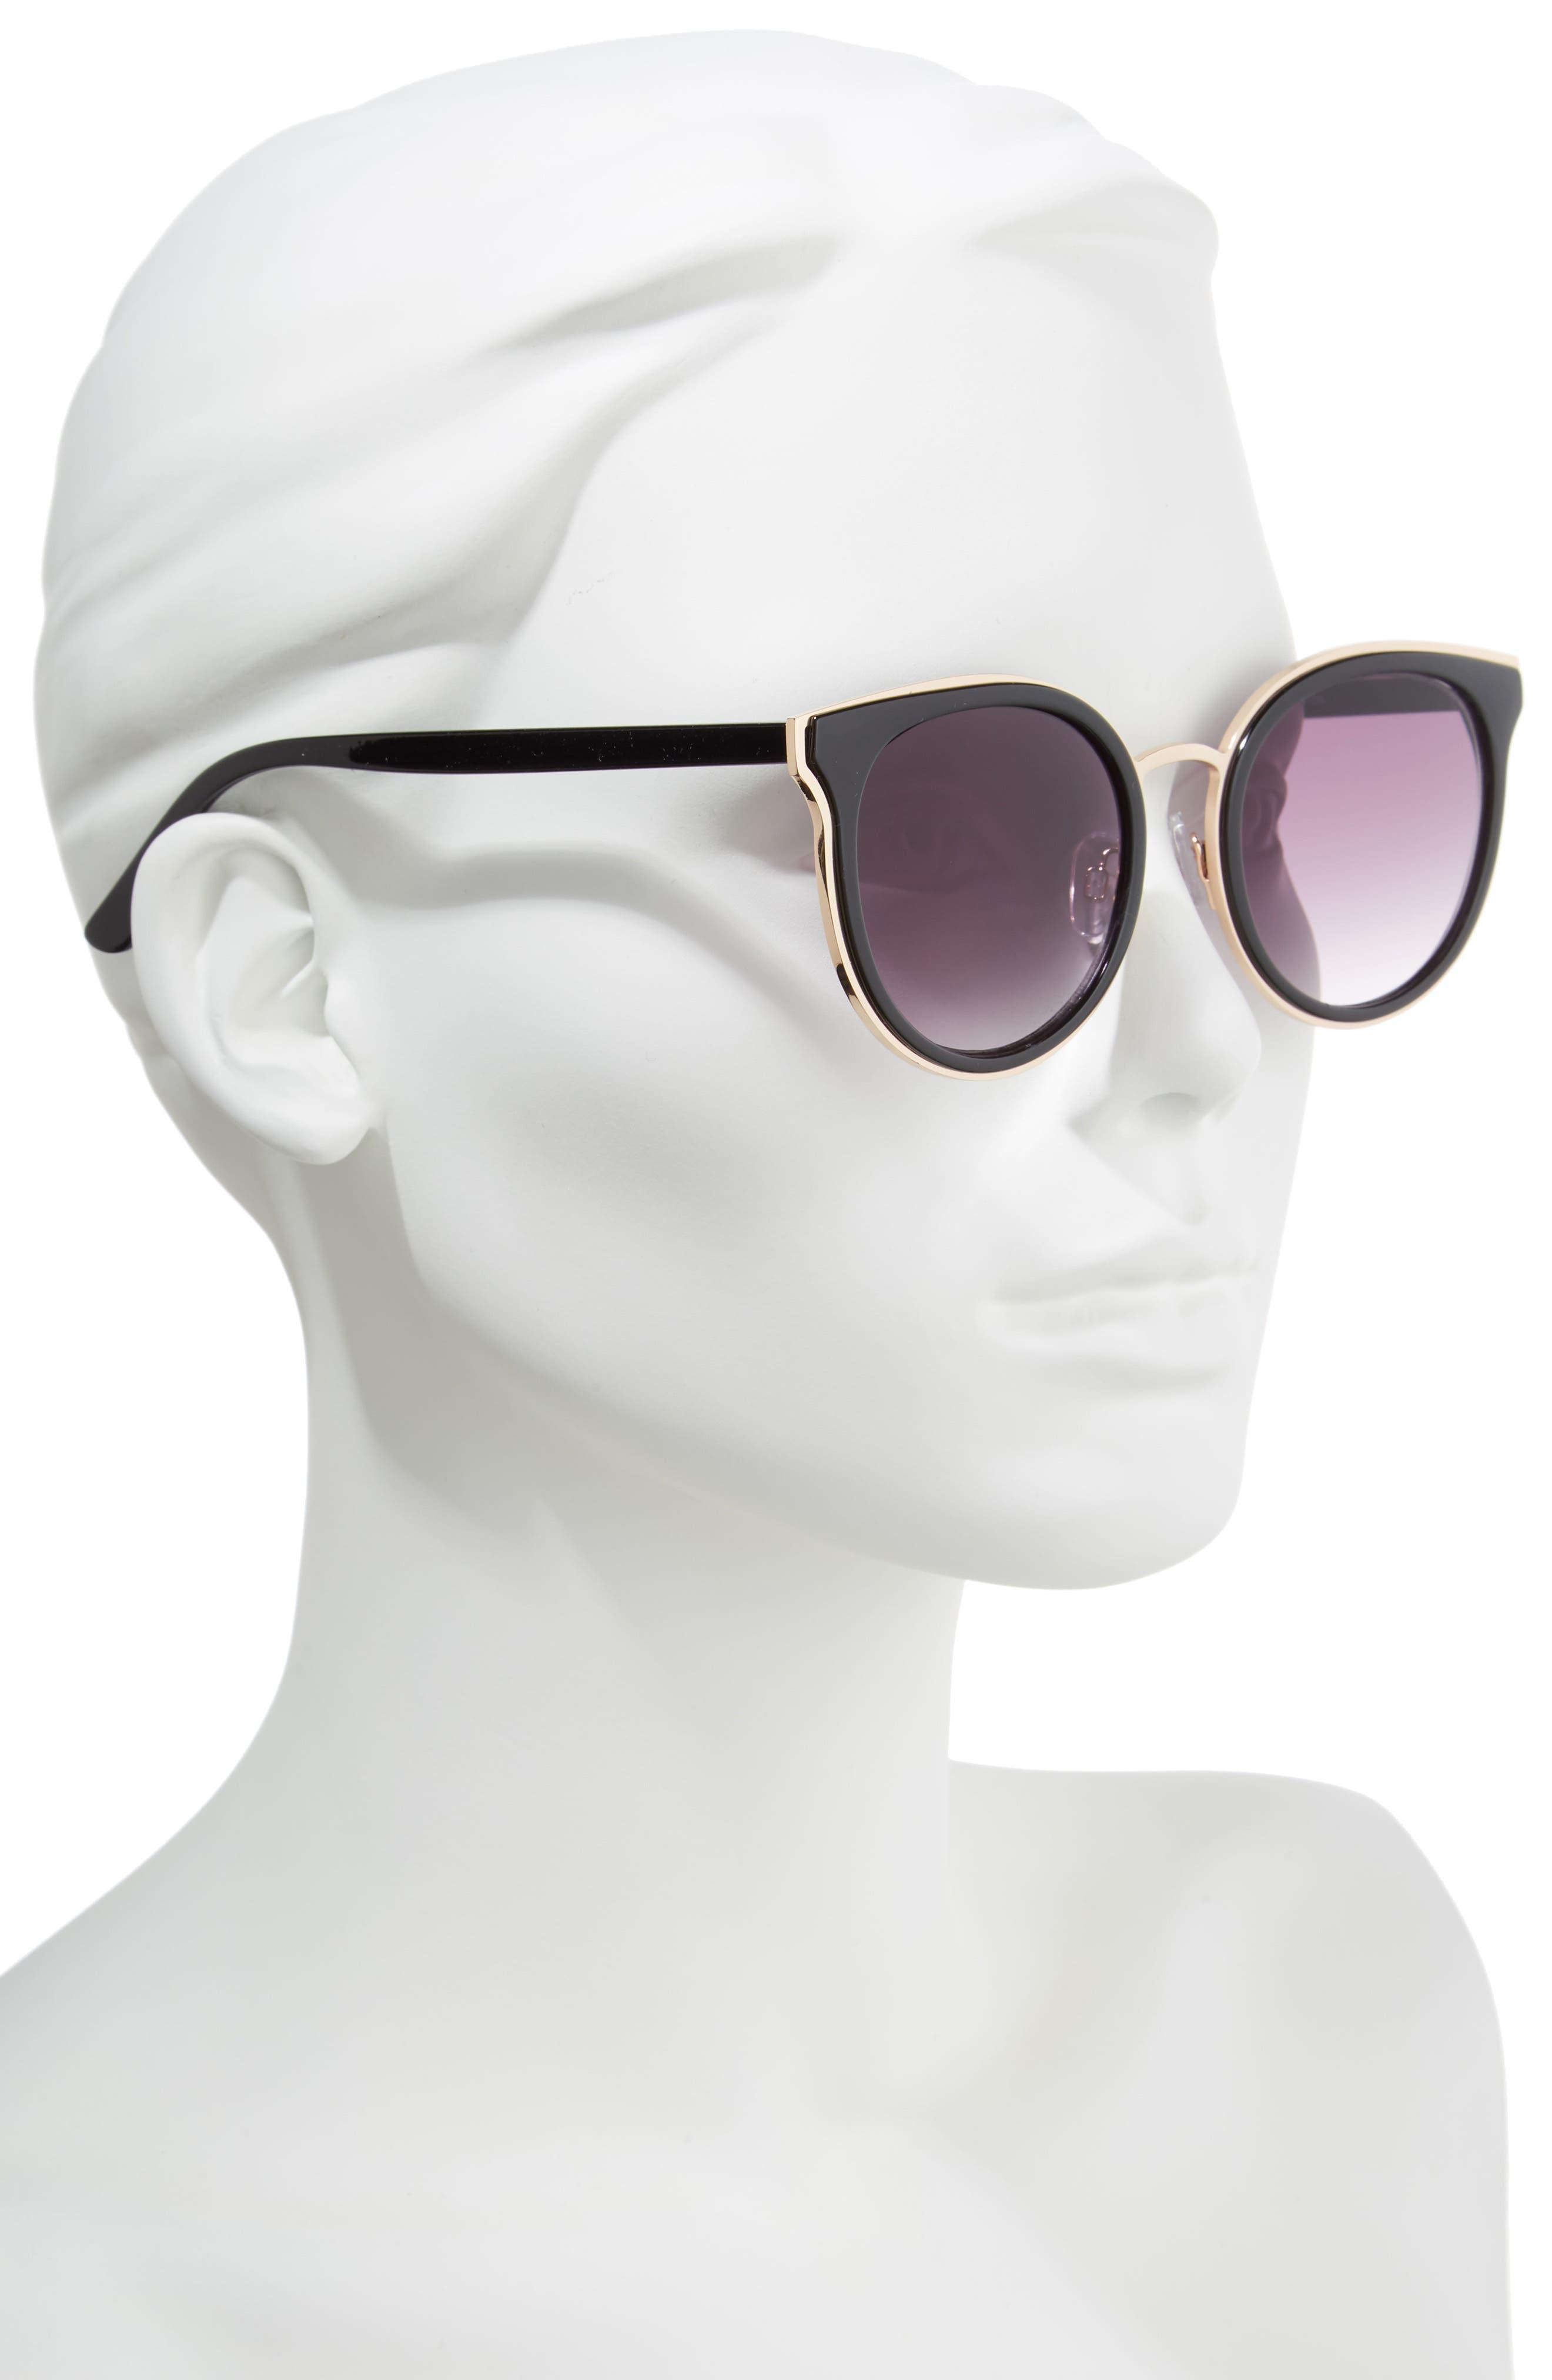 59mm Round Sunglasses,                             Alternate thumbnail 2, color,                             Gold/ Black